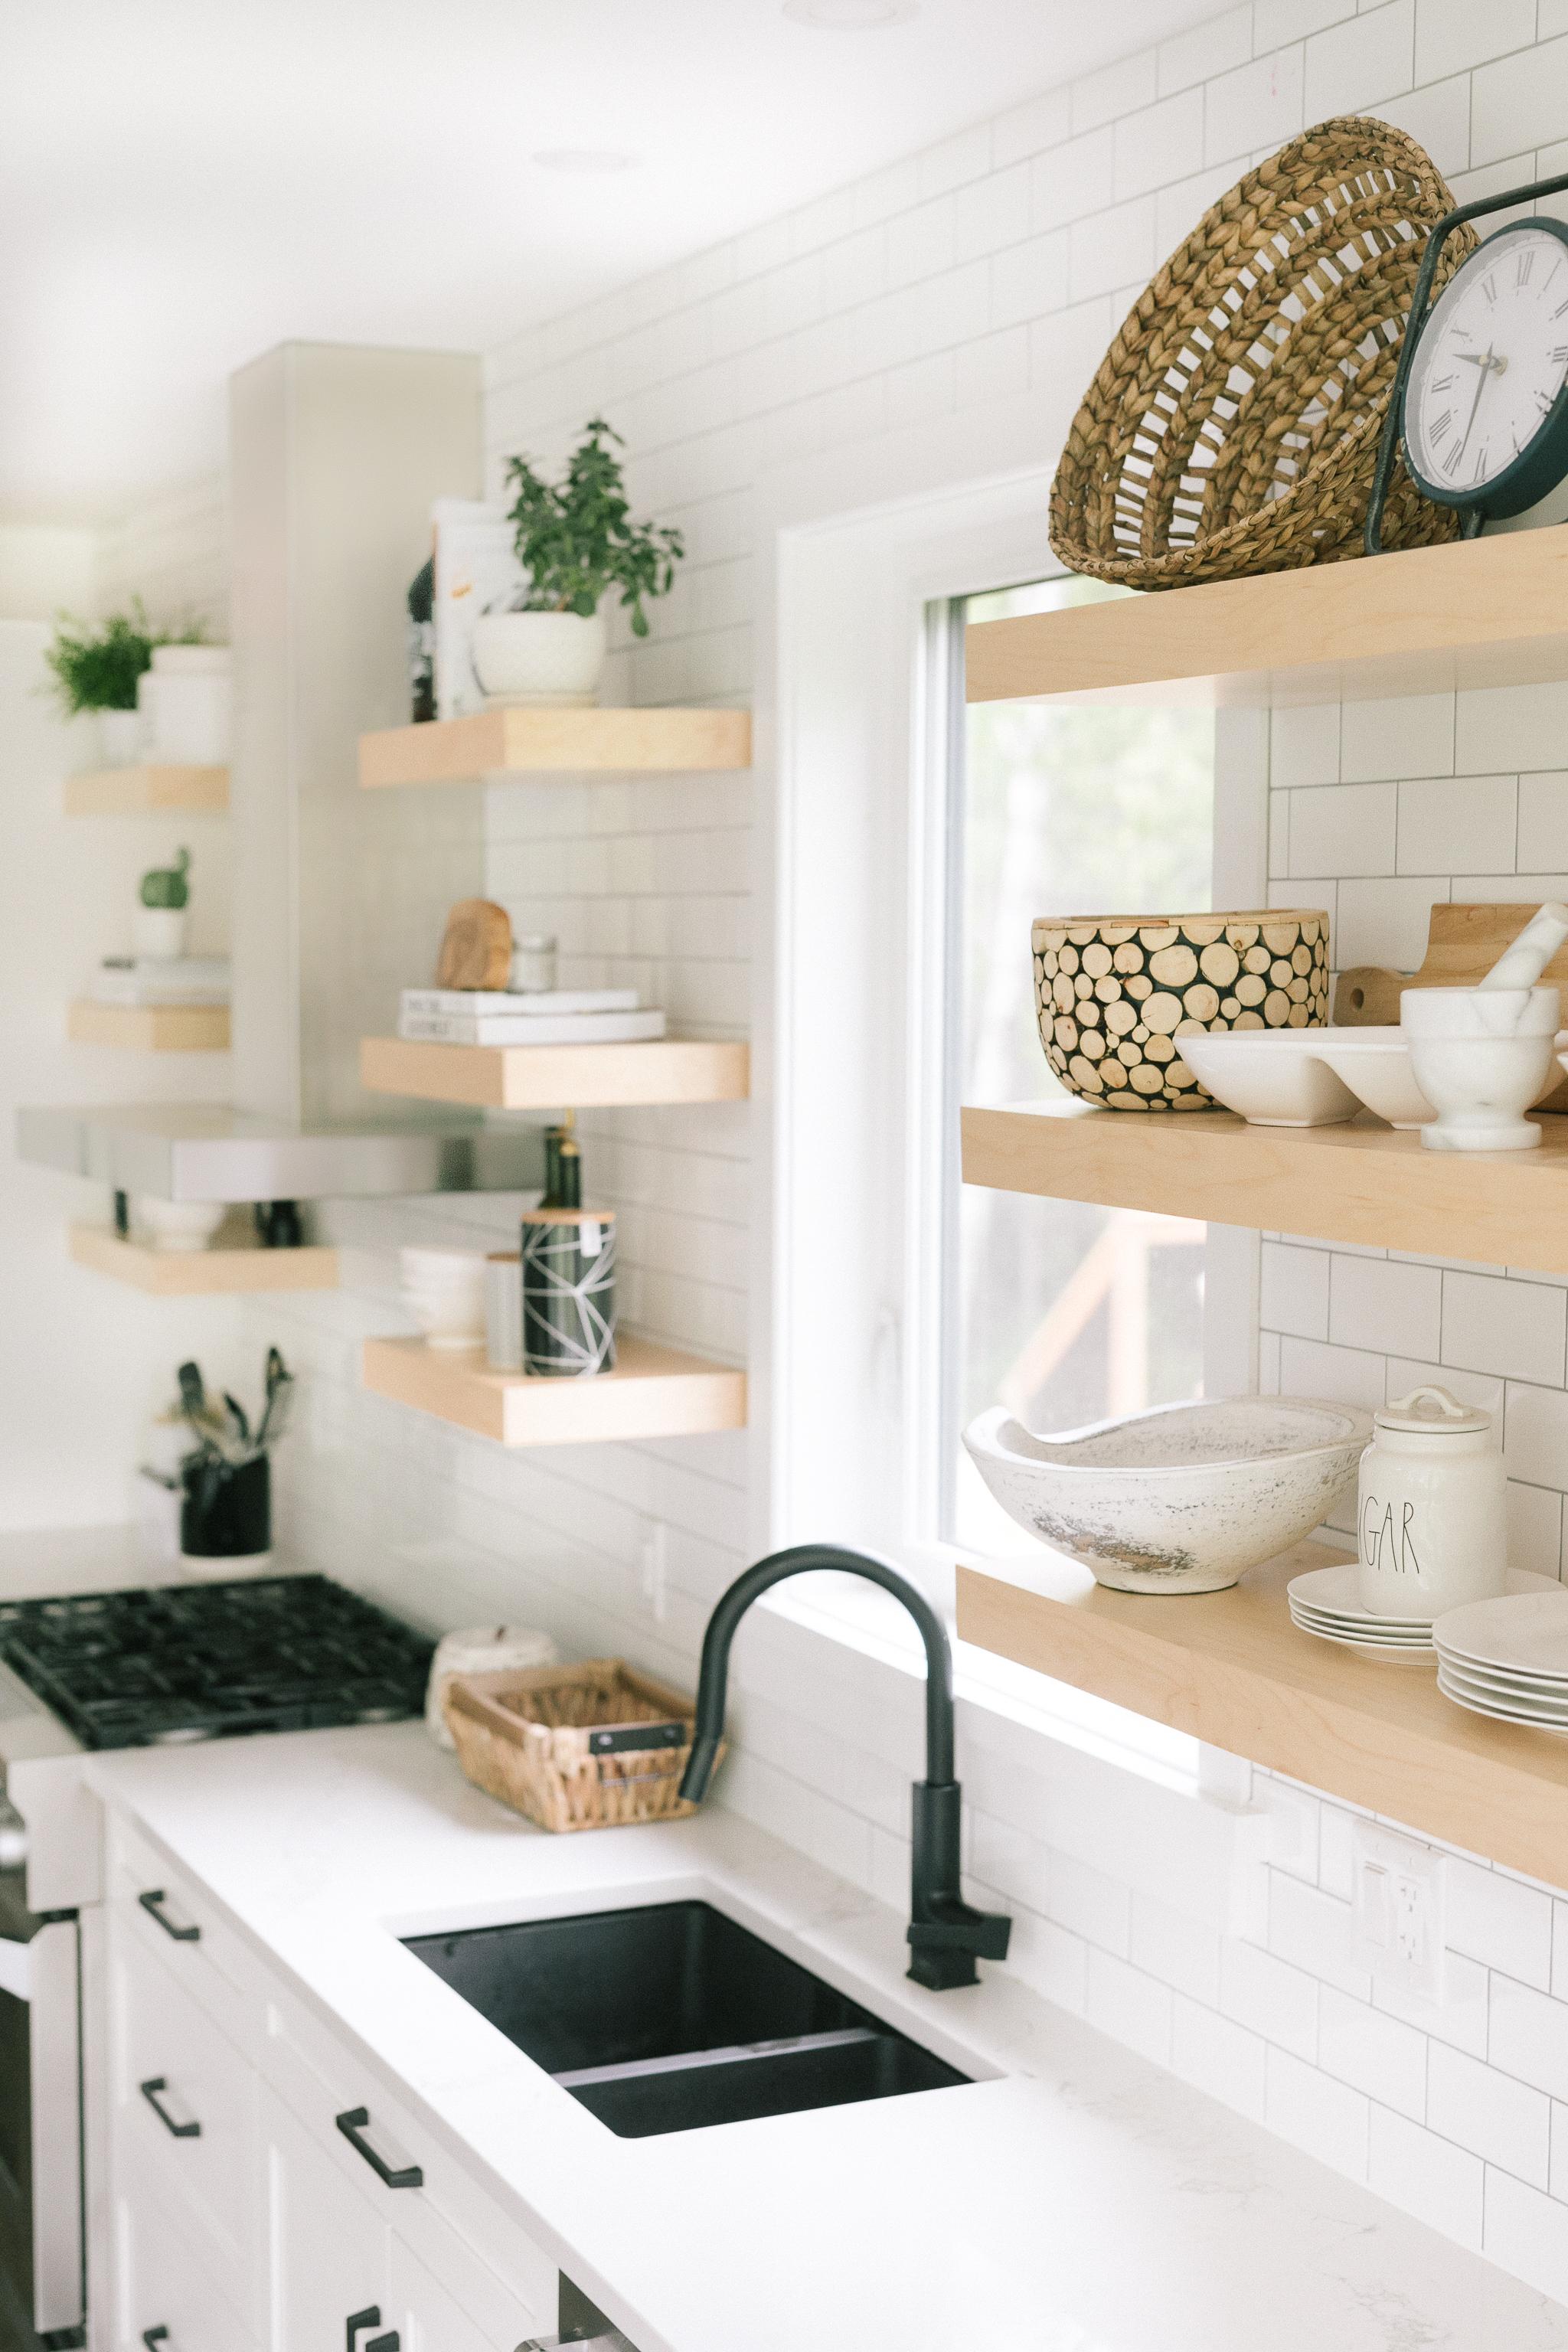 Interior-Design-Carp-Project-Kitchen-Bowls-Open-Shelfs